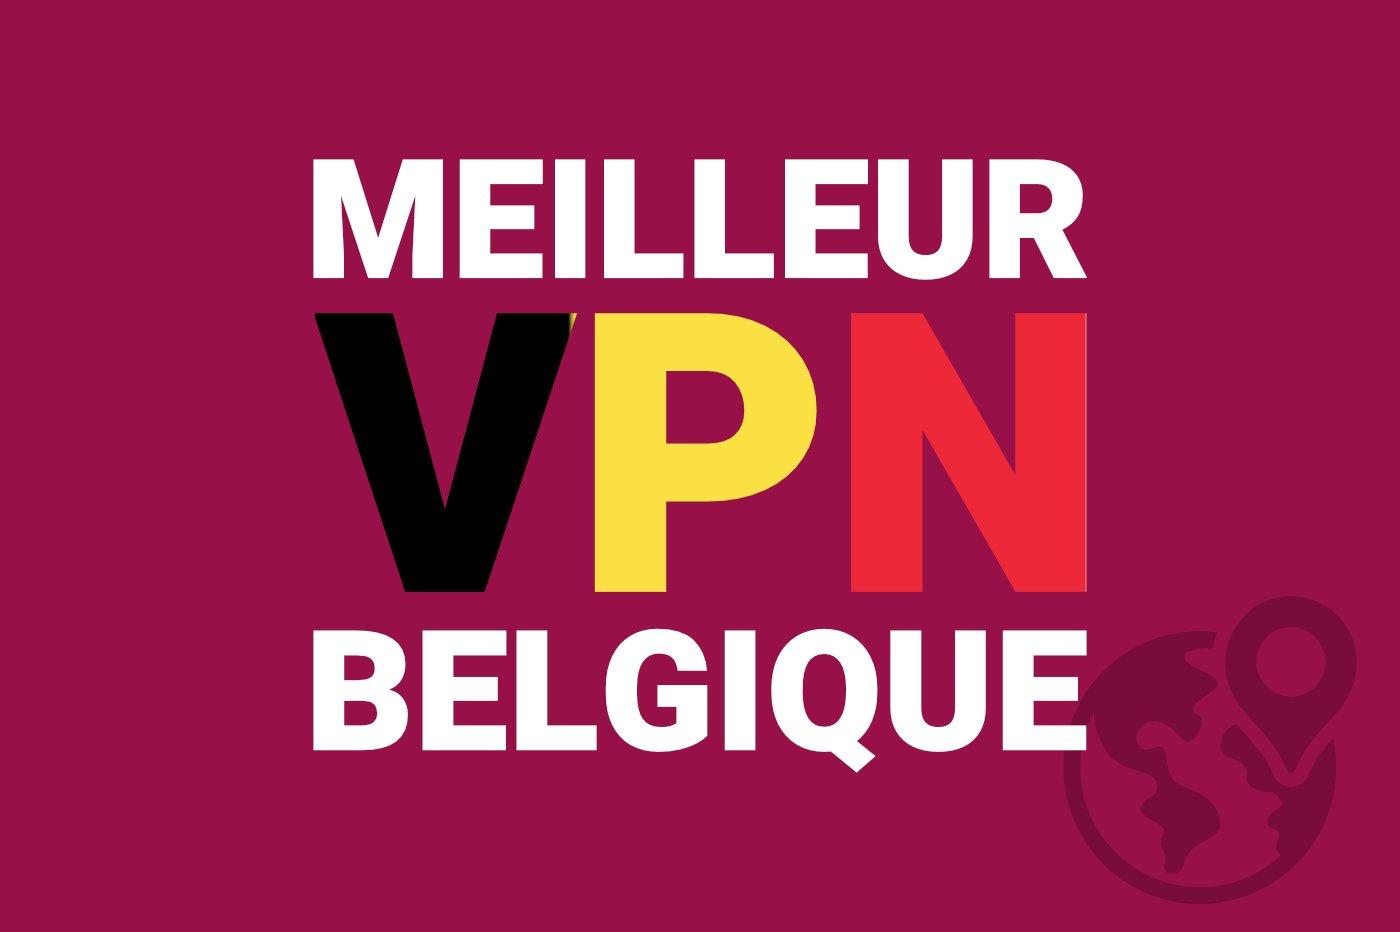 meilleur-vpn-belgique